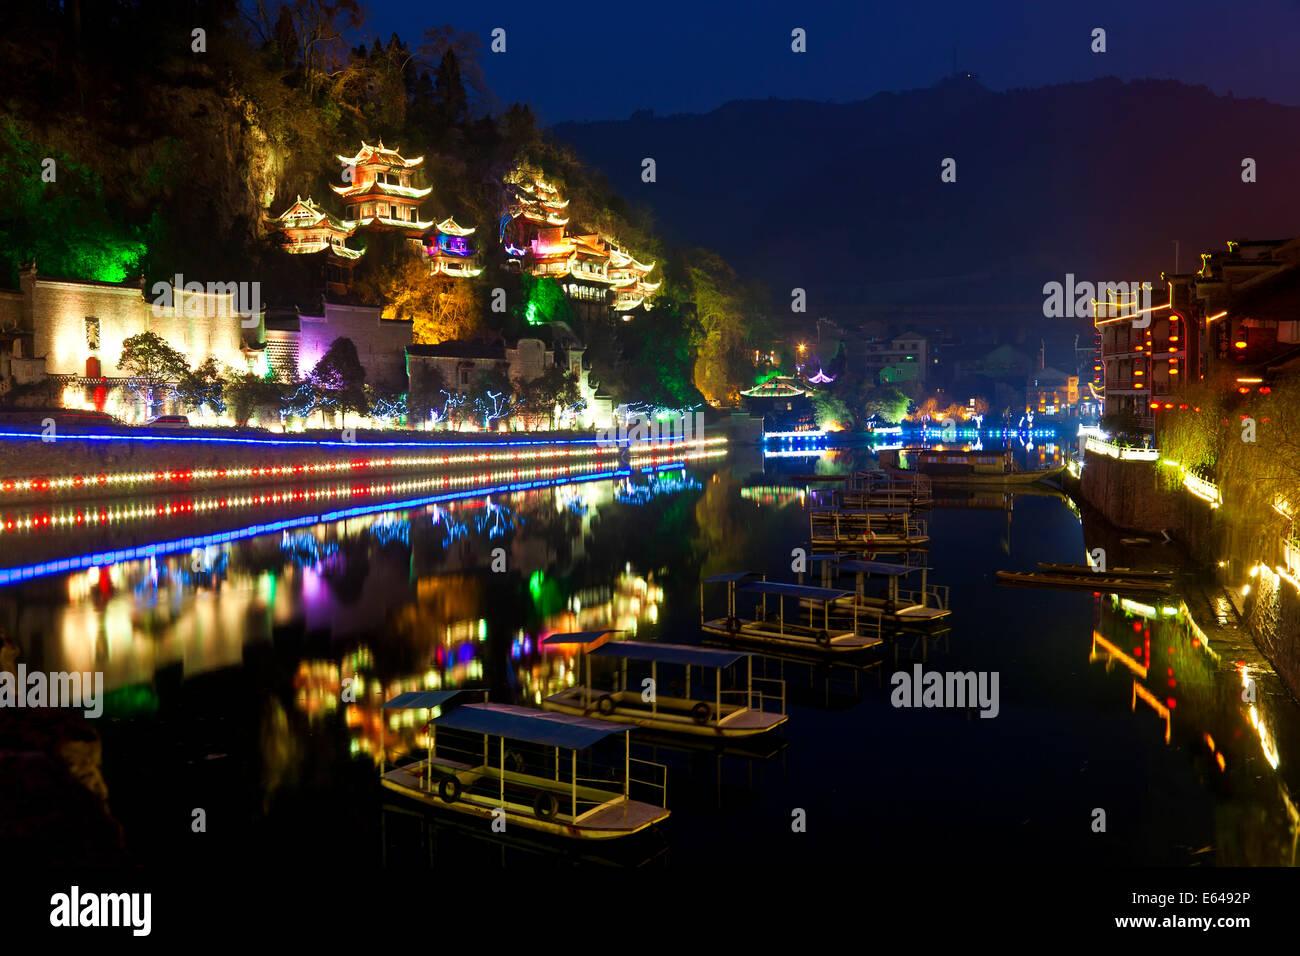 Zhenyuan beleuchtet in der Abenddämmerung, Zhenyuan, Guizhou, China Stockbild